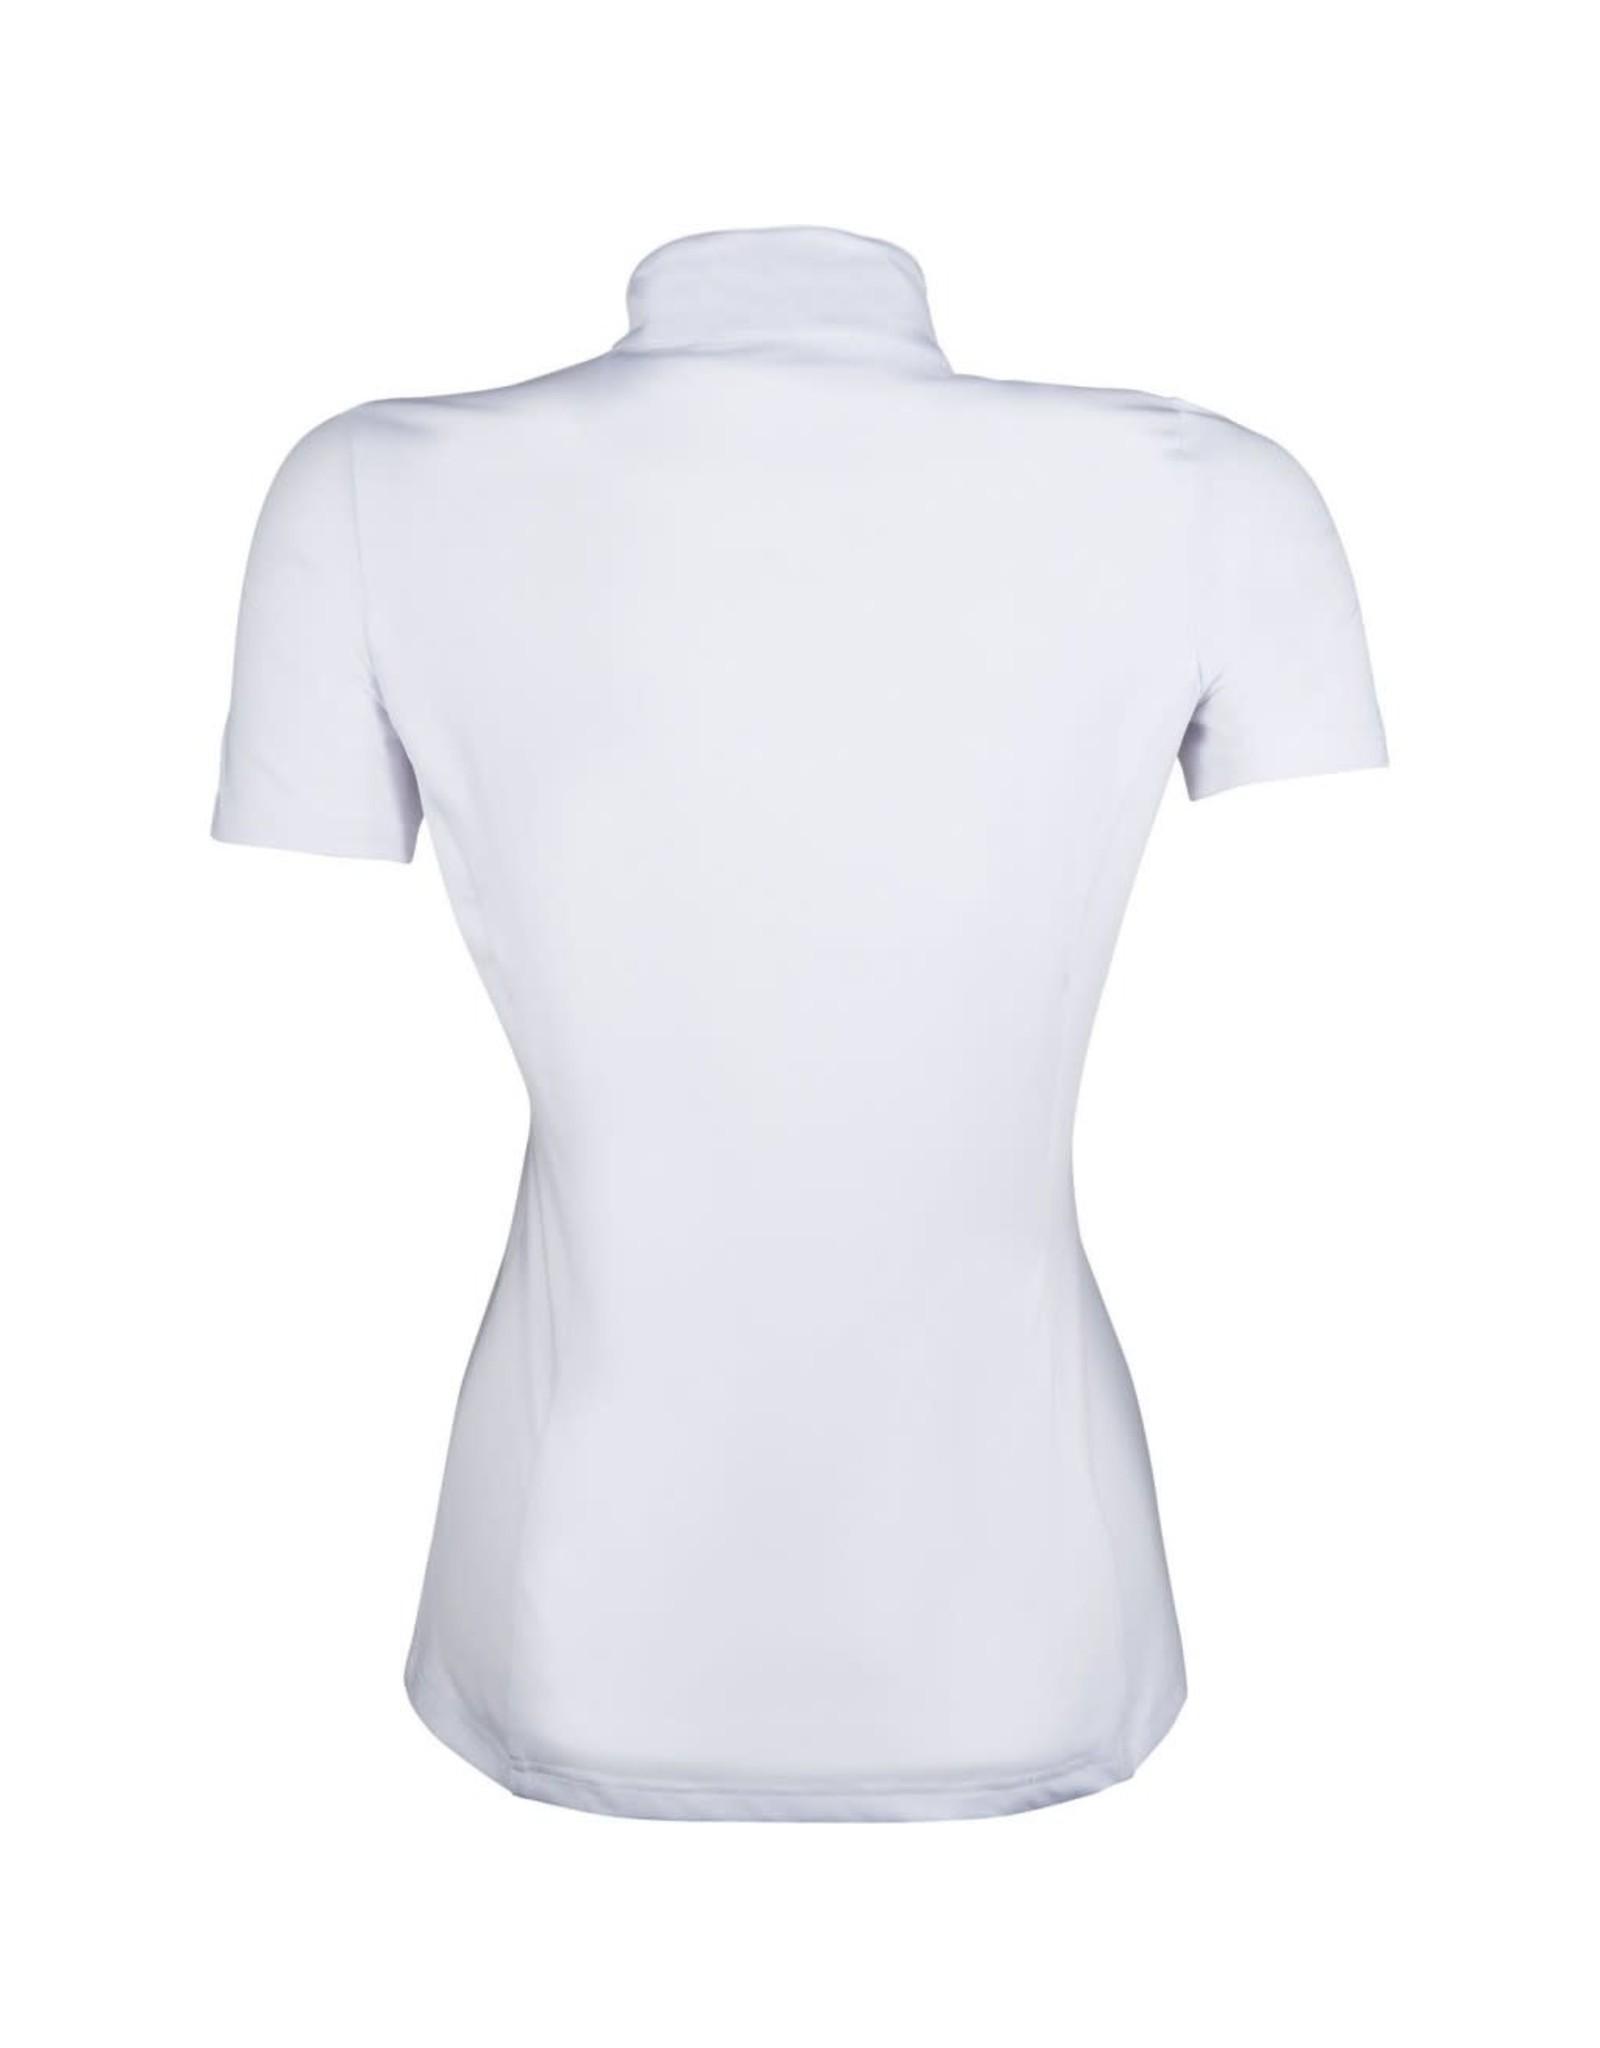 HKM Show Shirt Hunter Short Sleeve Kids